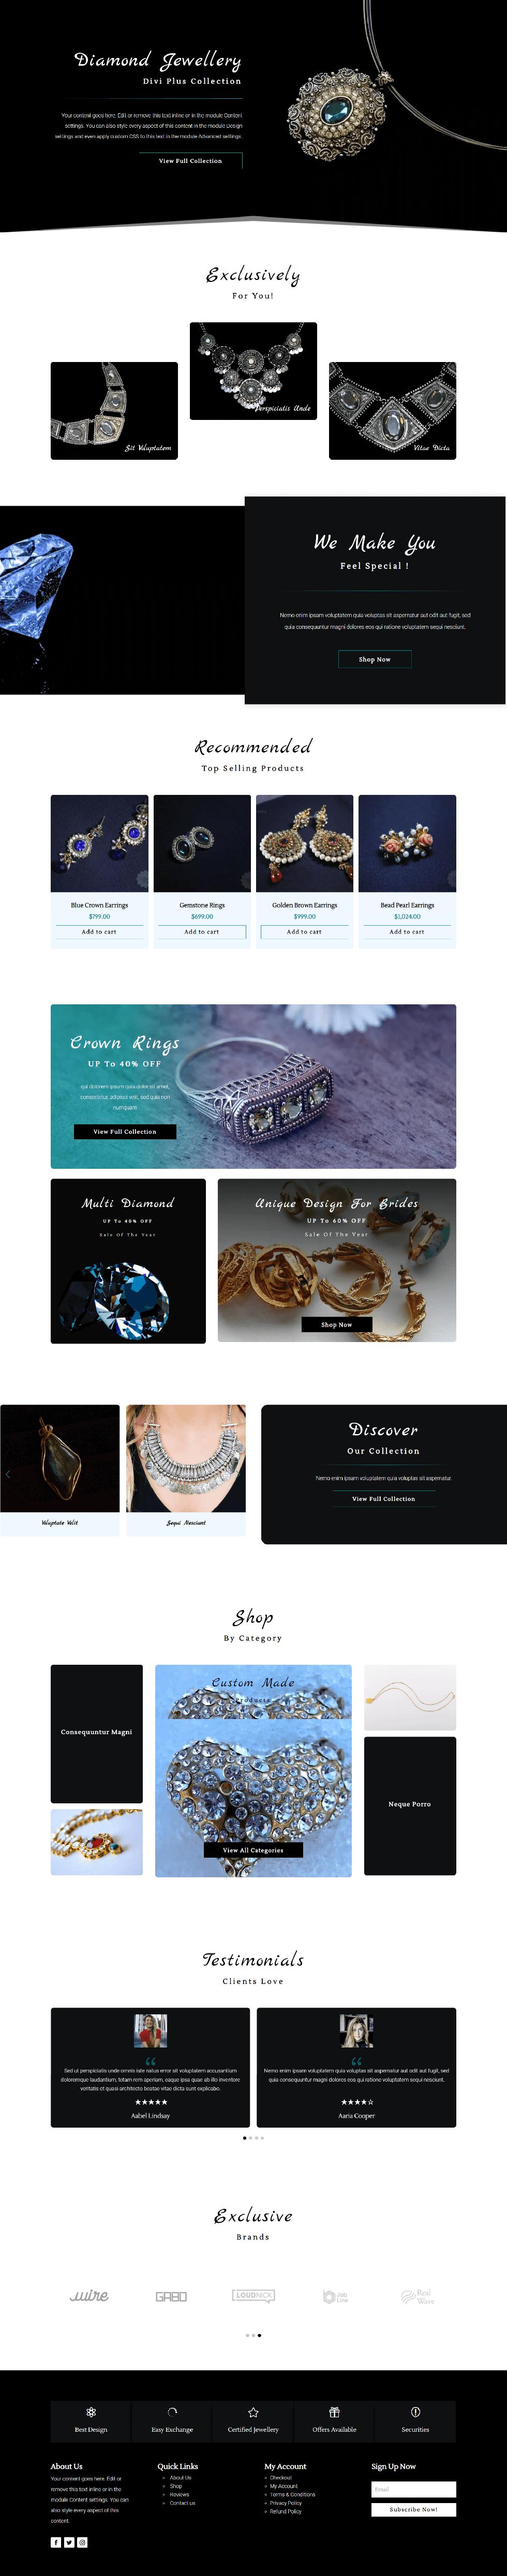 Divi Plus Jewellery Store Image